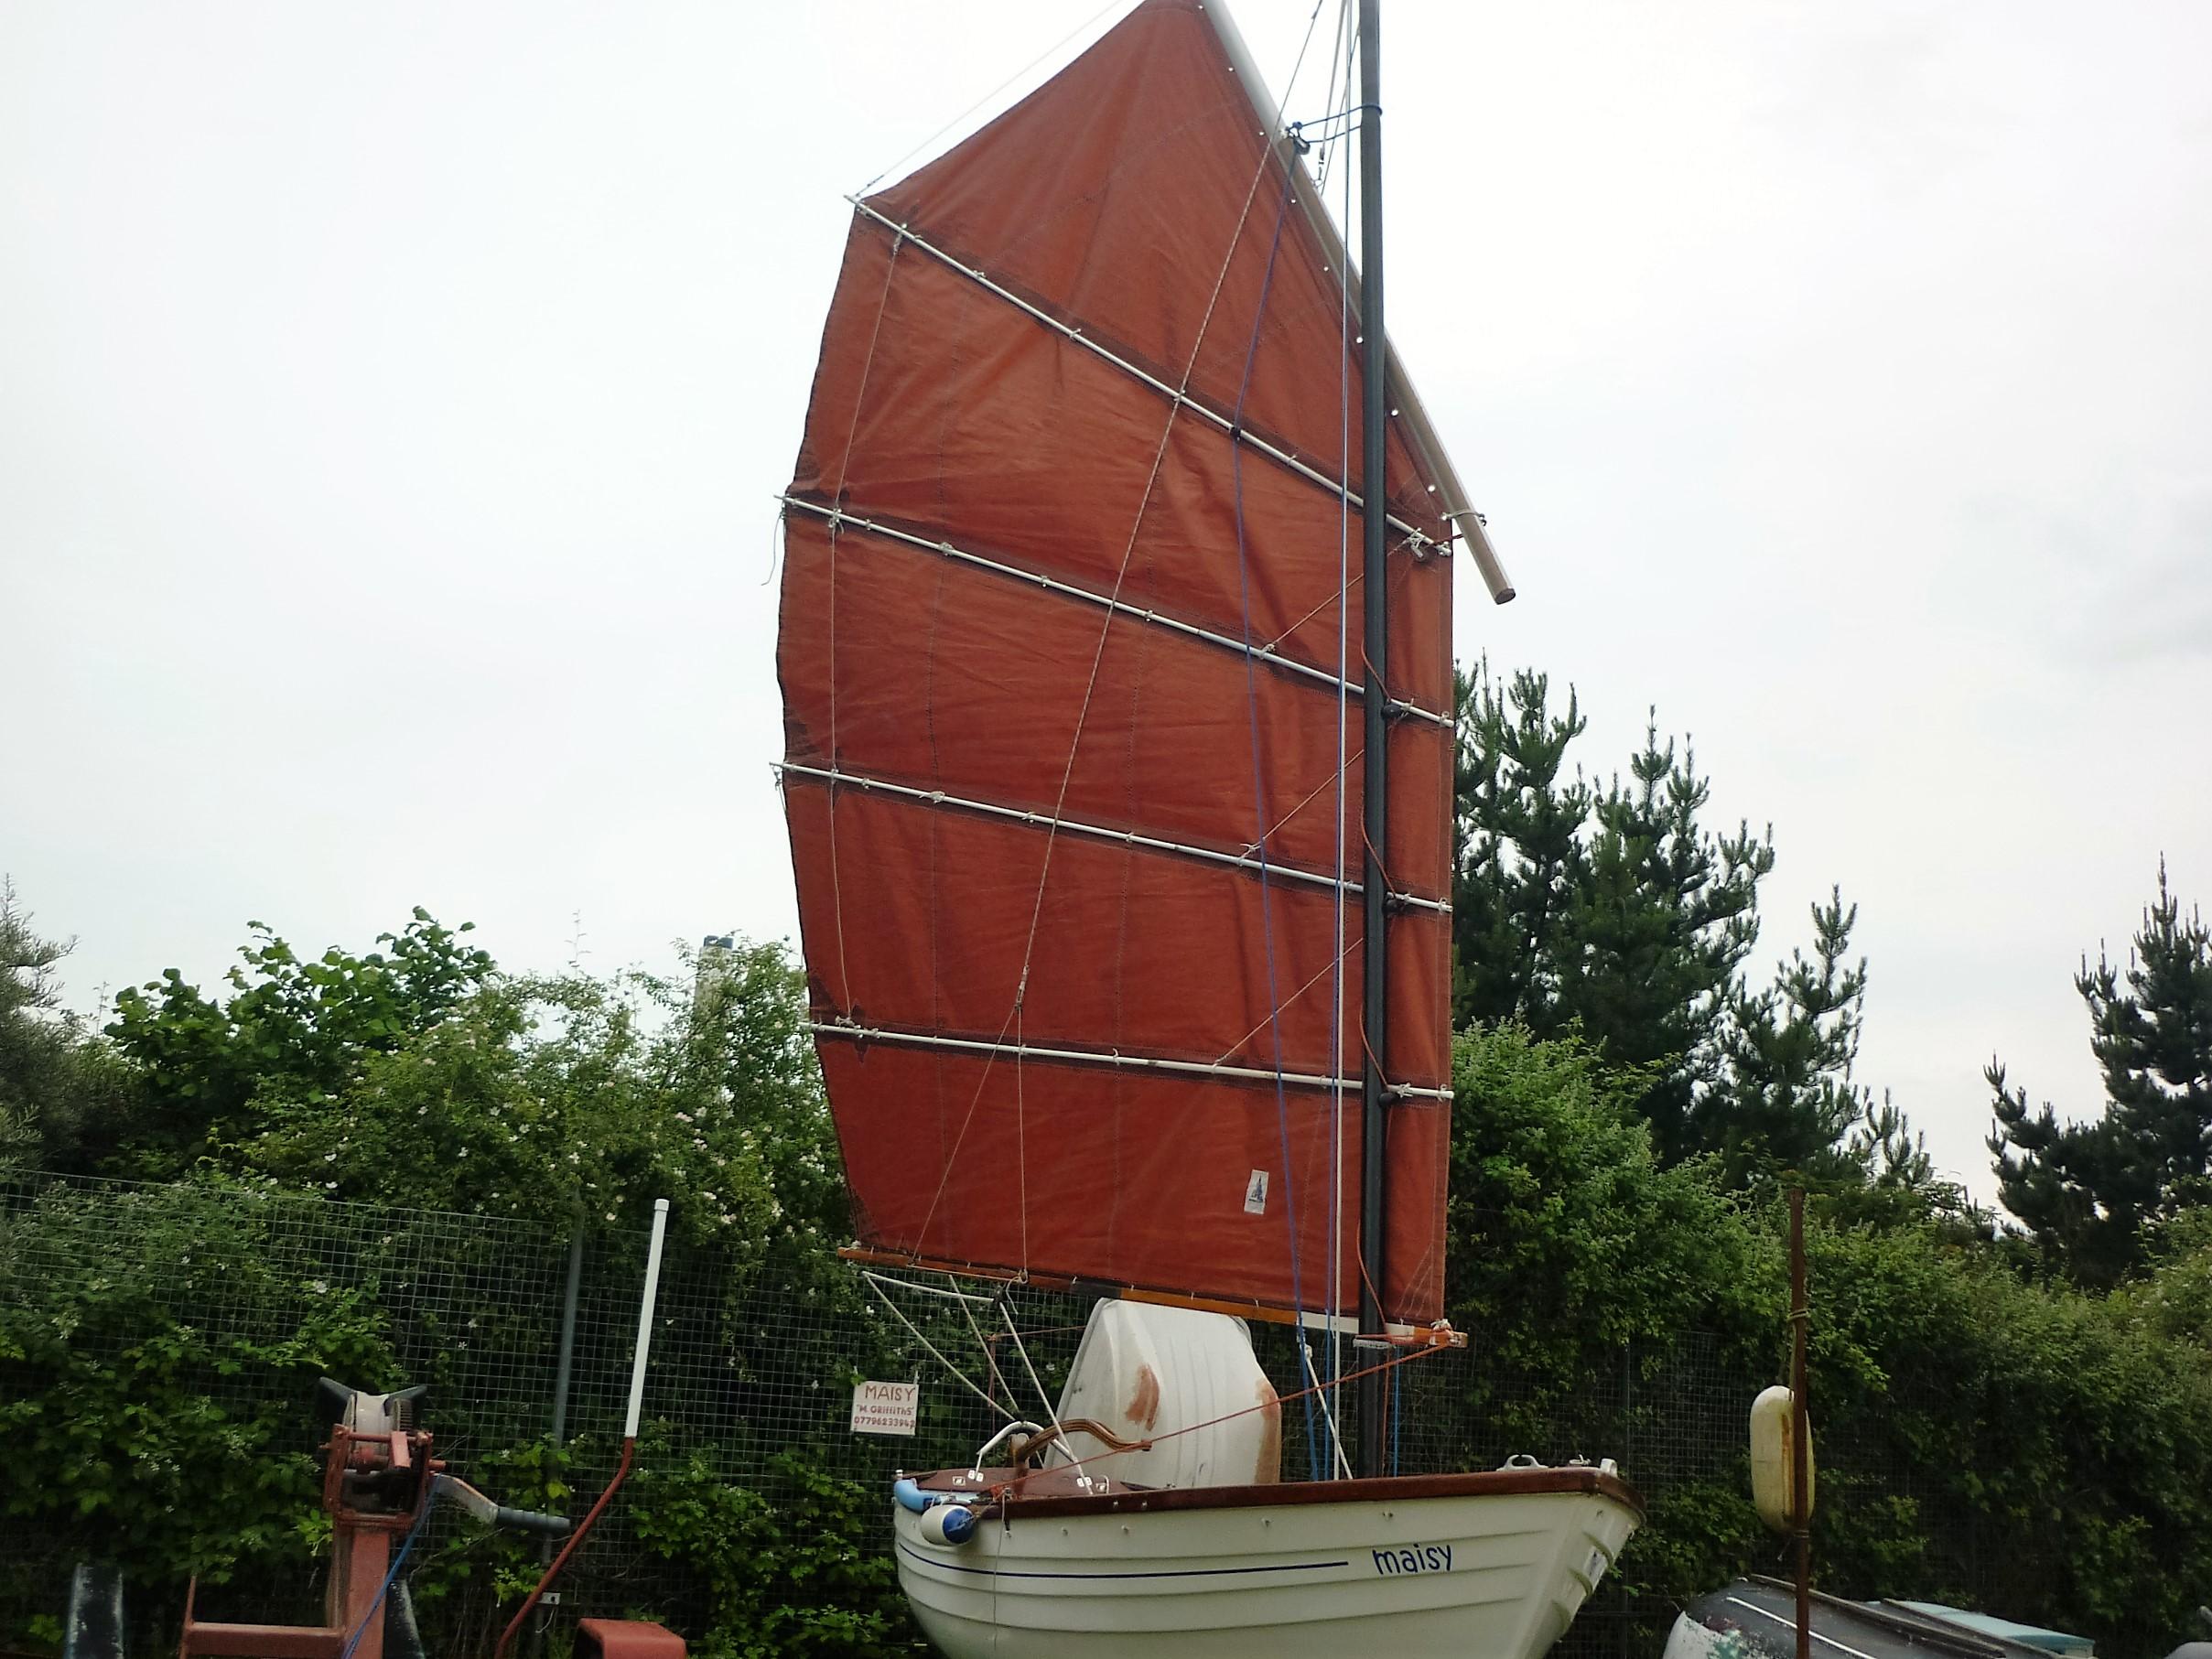 Falmouth Bass